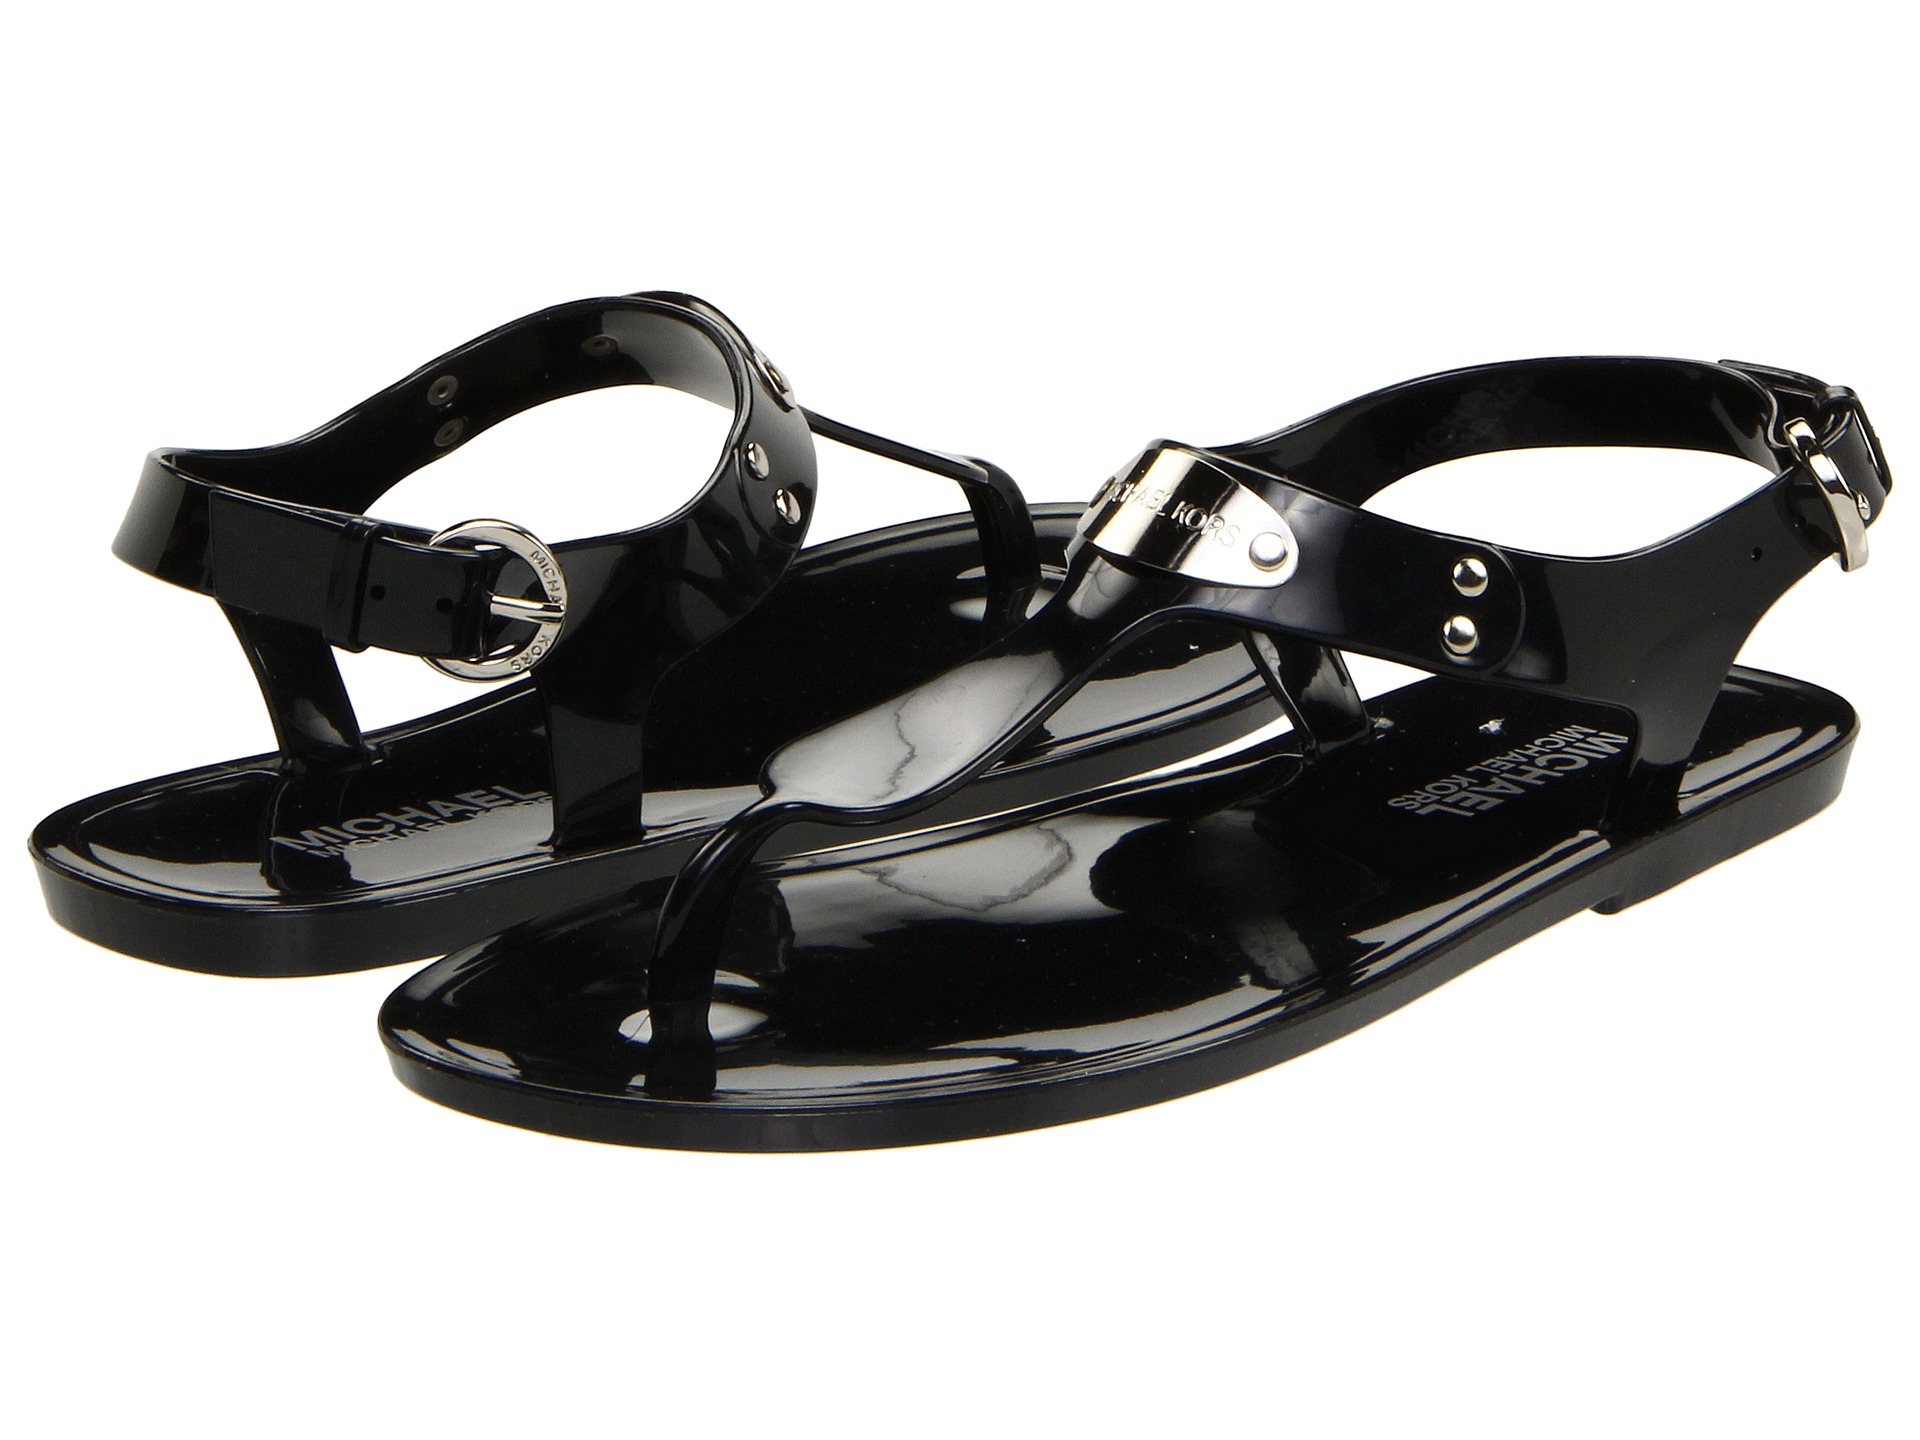 Black sandals michael kors - Michael Michael Kors Mk Plate Jelly Zappos Com Free Shipping Both Ways